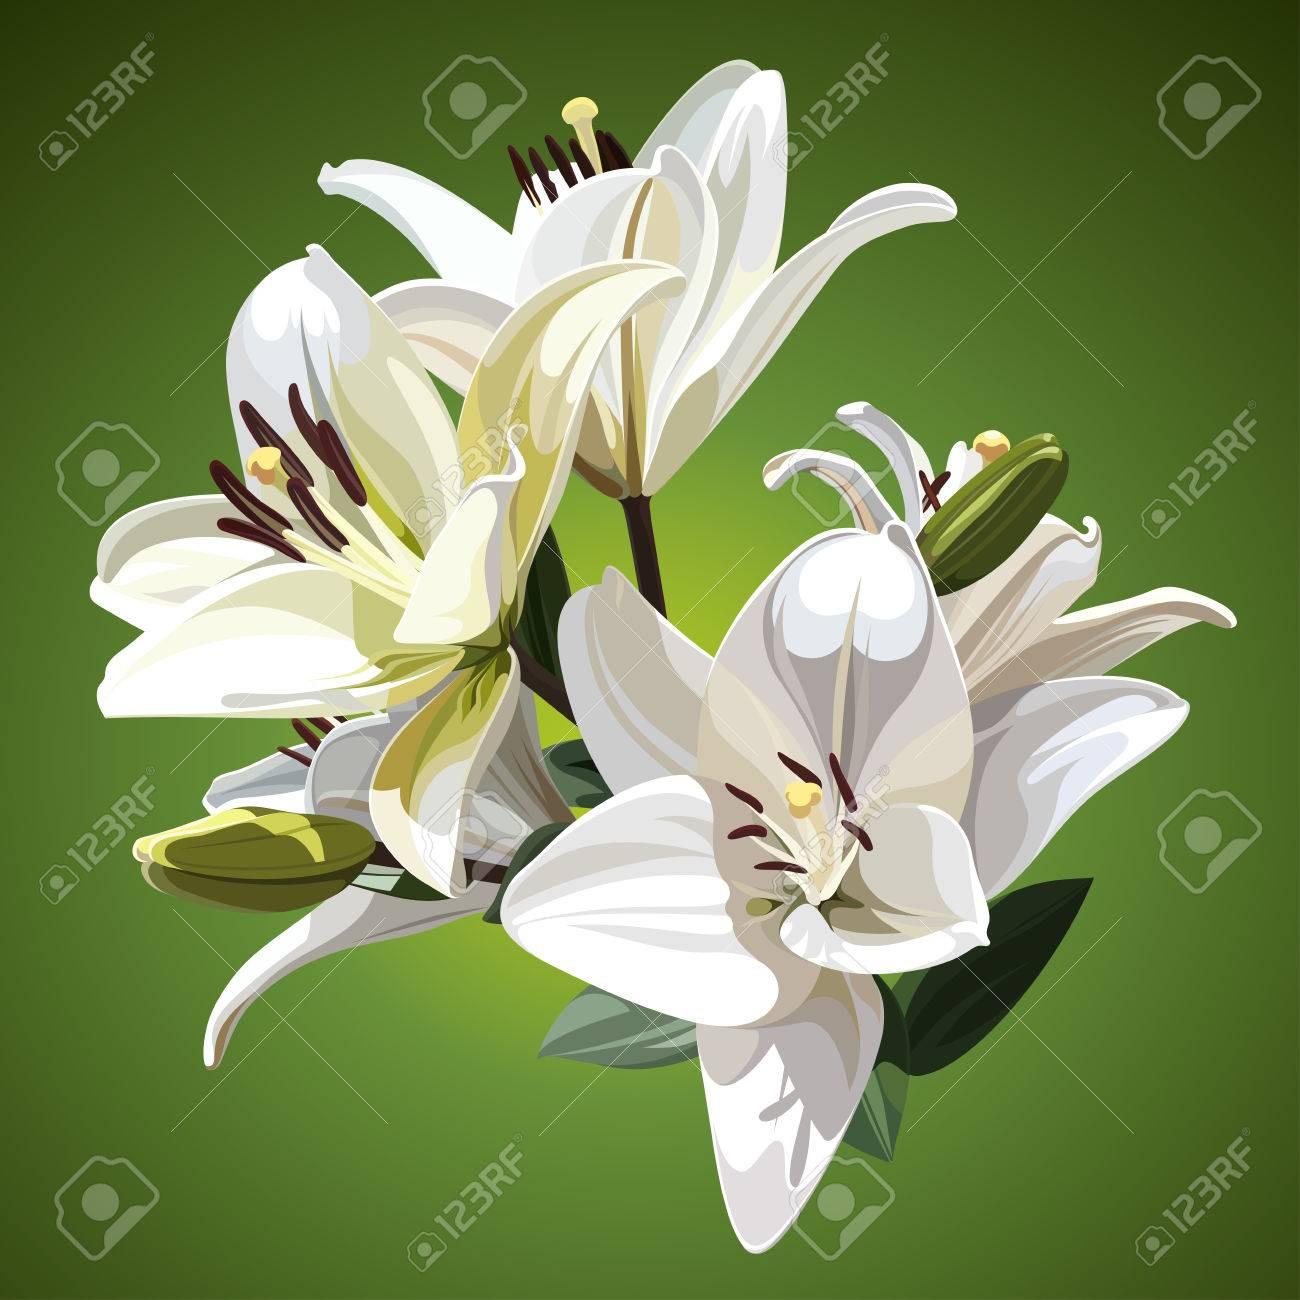 White flowers of lilium candidum madonna lily illustration white flowers of lilium candidum madonna lily illustration on green background stock izmirmasajfo Gallery